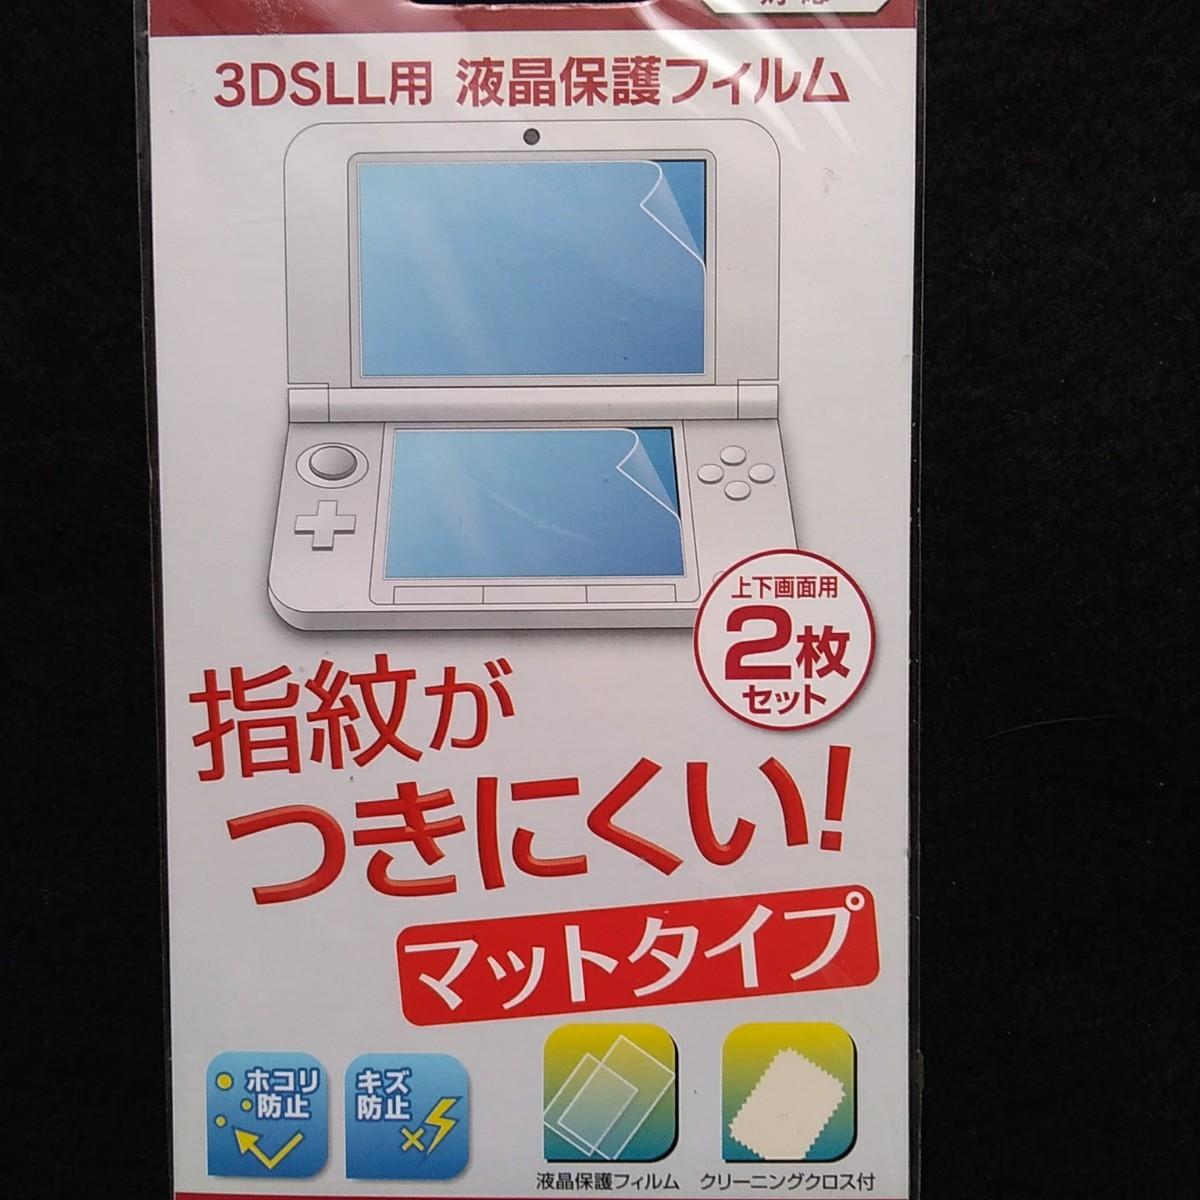 3DSLL用液晶保護フィルム